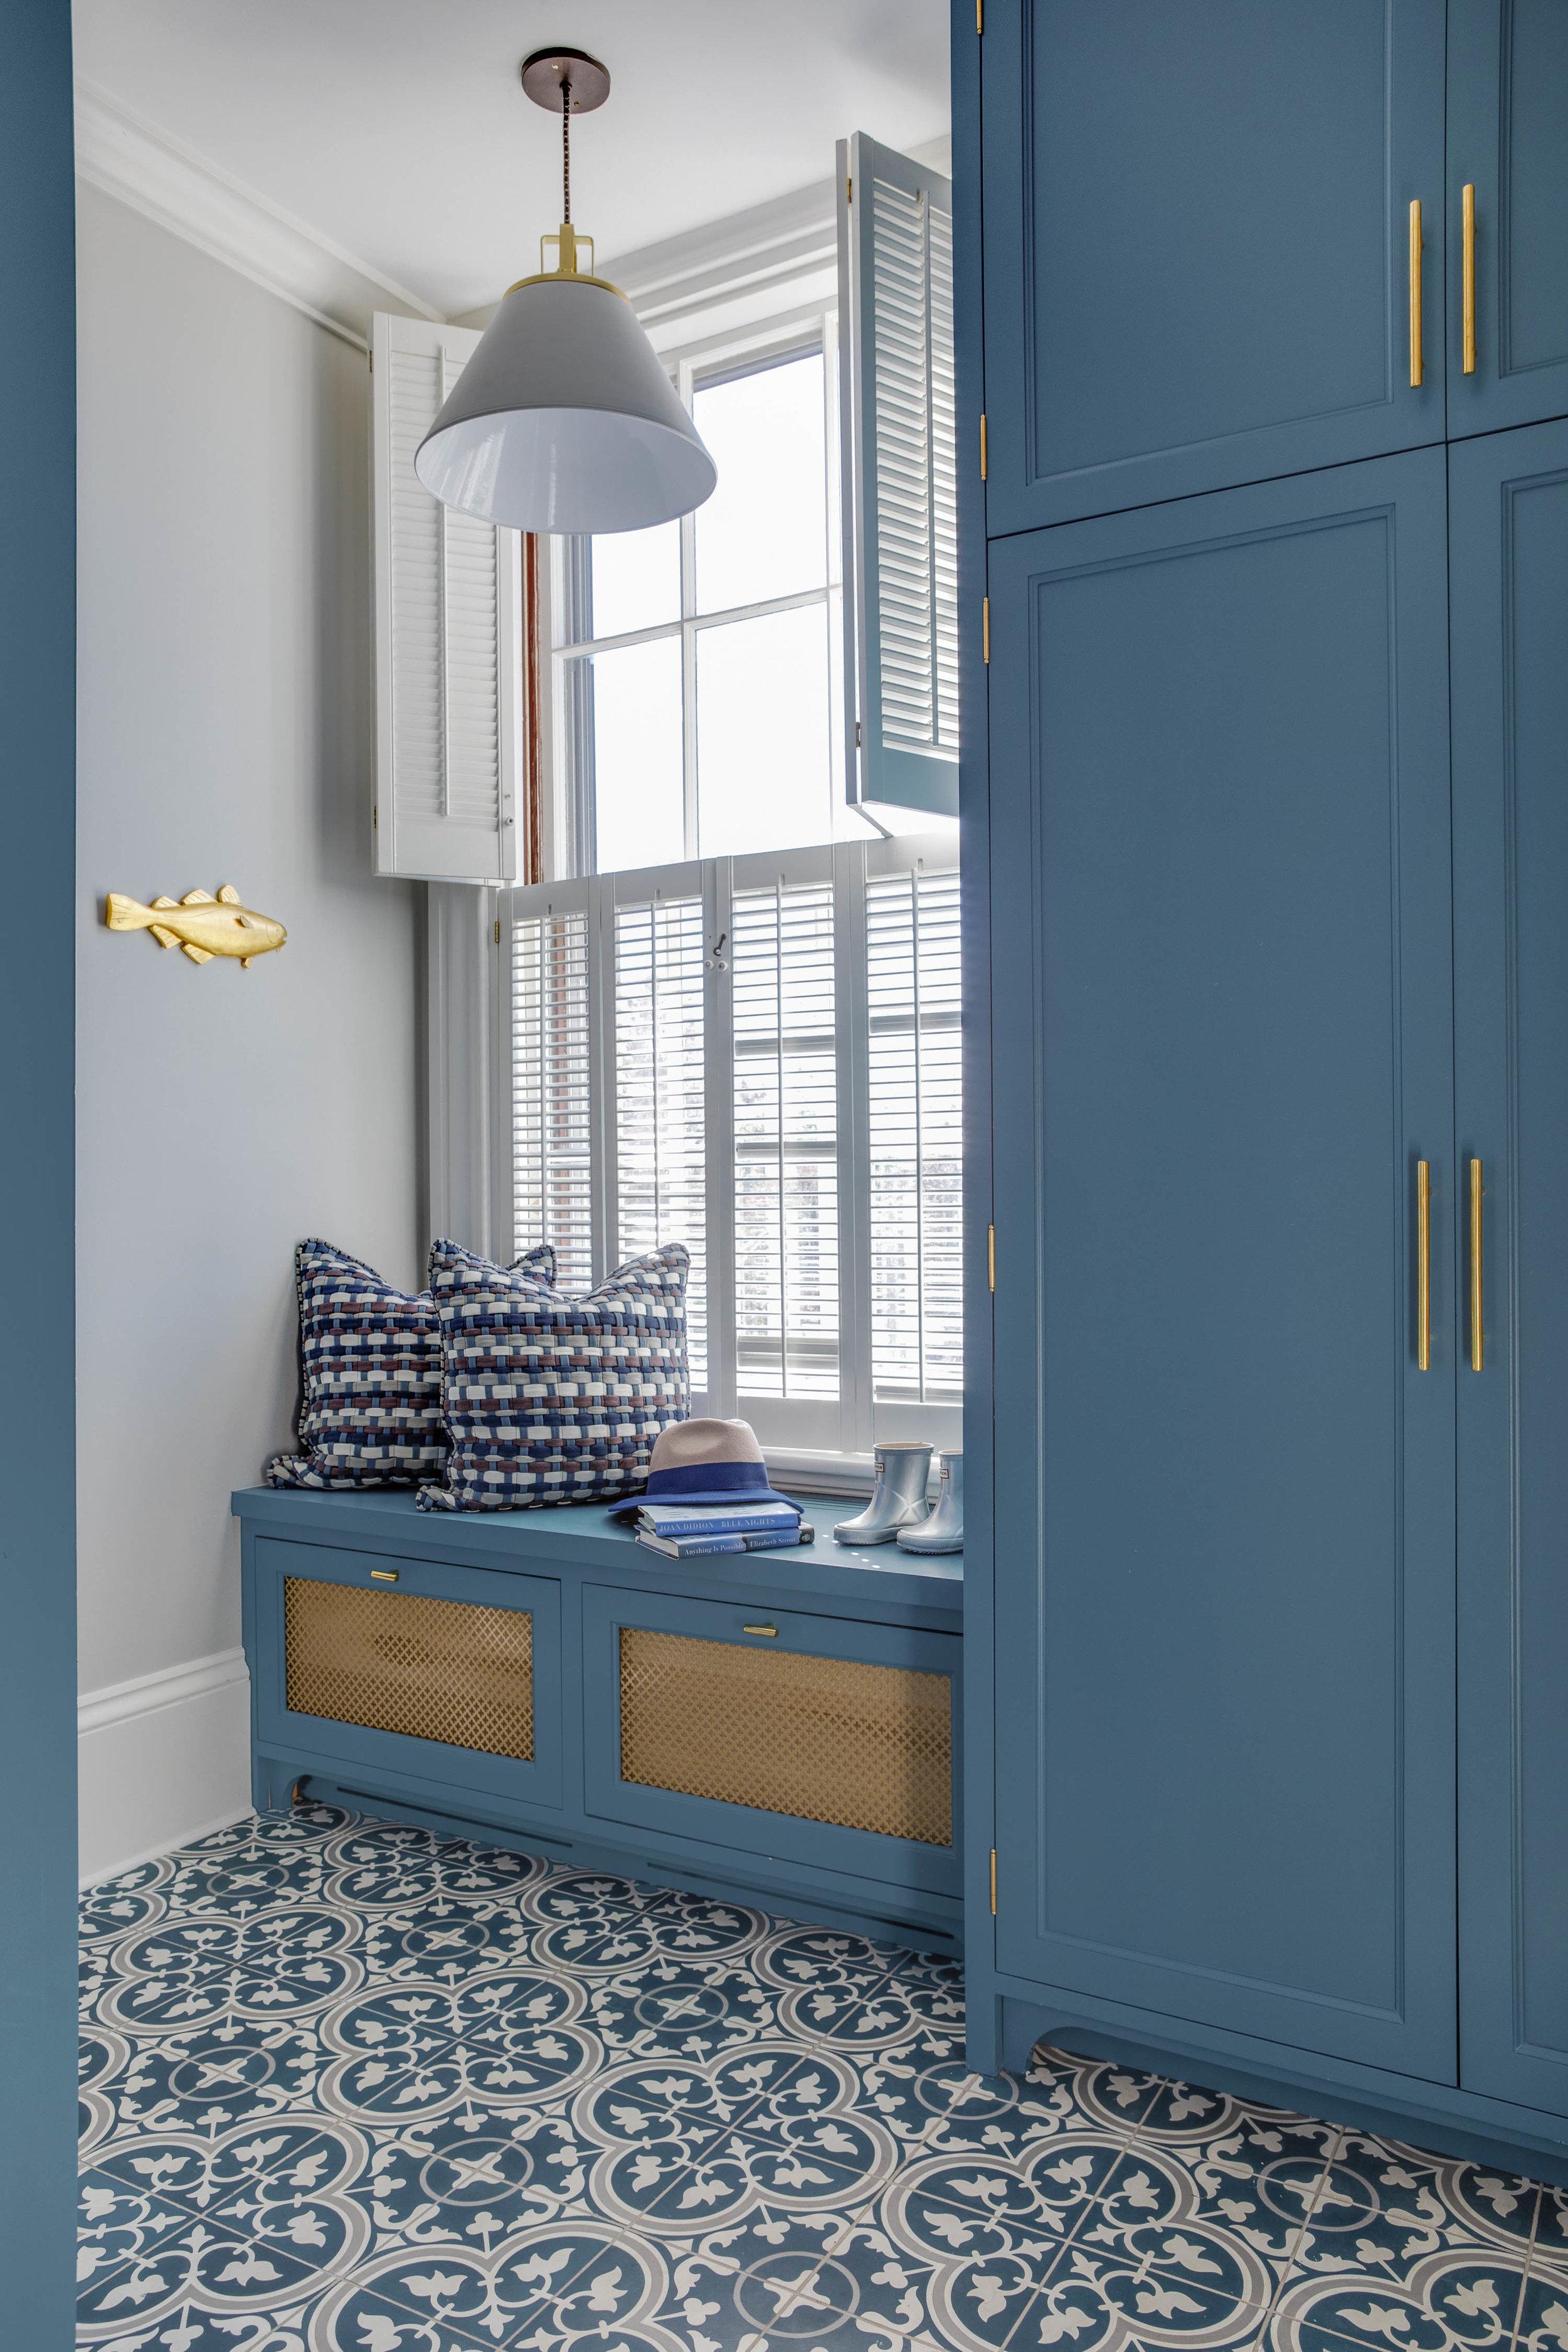 Digs Design, Digs, Digs Design Company, Interior Design, Jocelyn Chiappone, Rhode Island, Newport, Providence, Benefit Street, Mudroom, Blue Cabinets, Tile floor